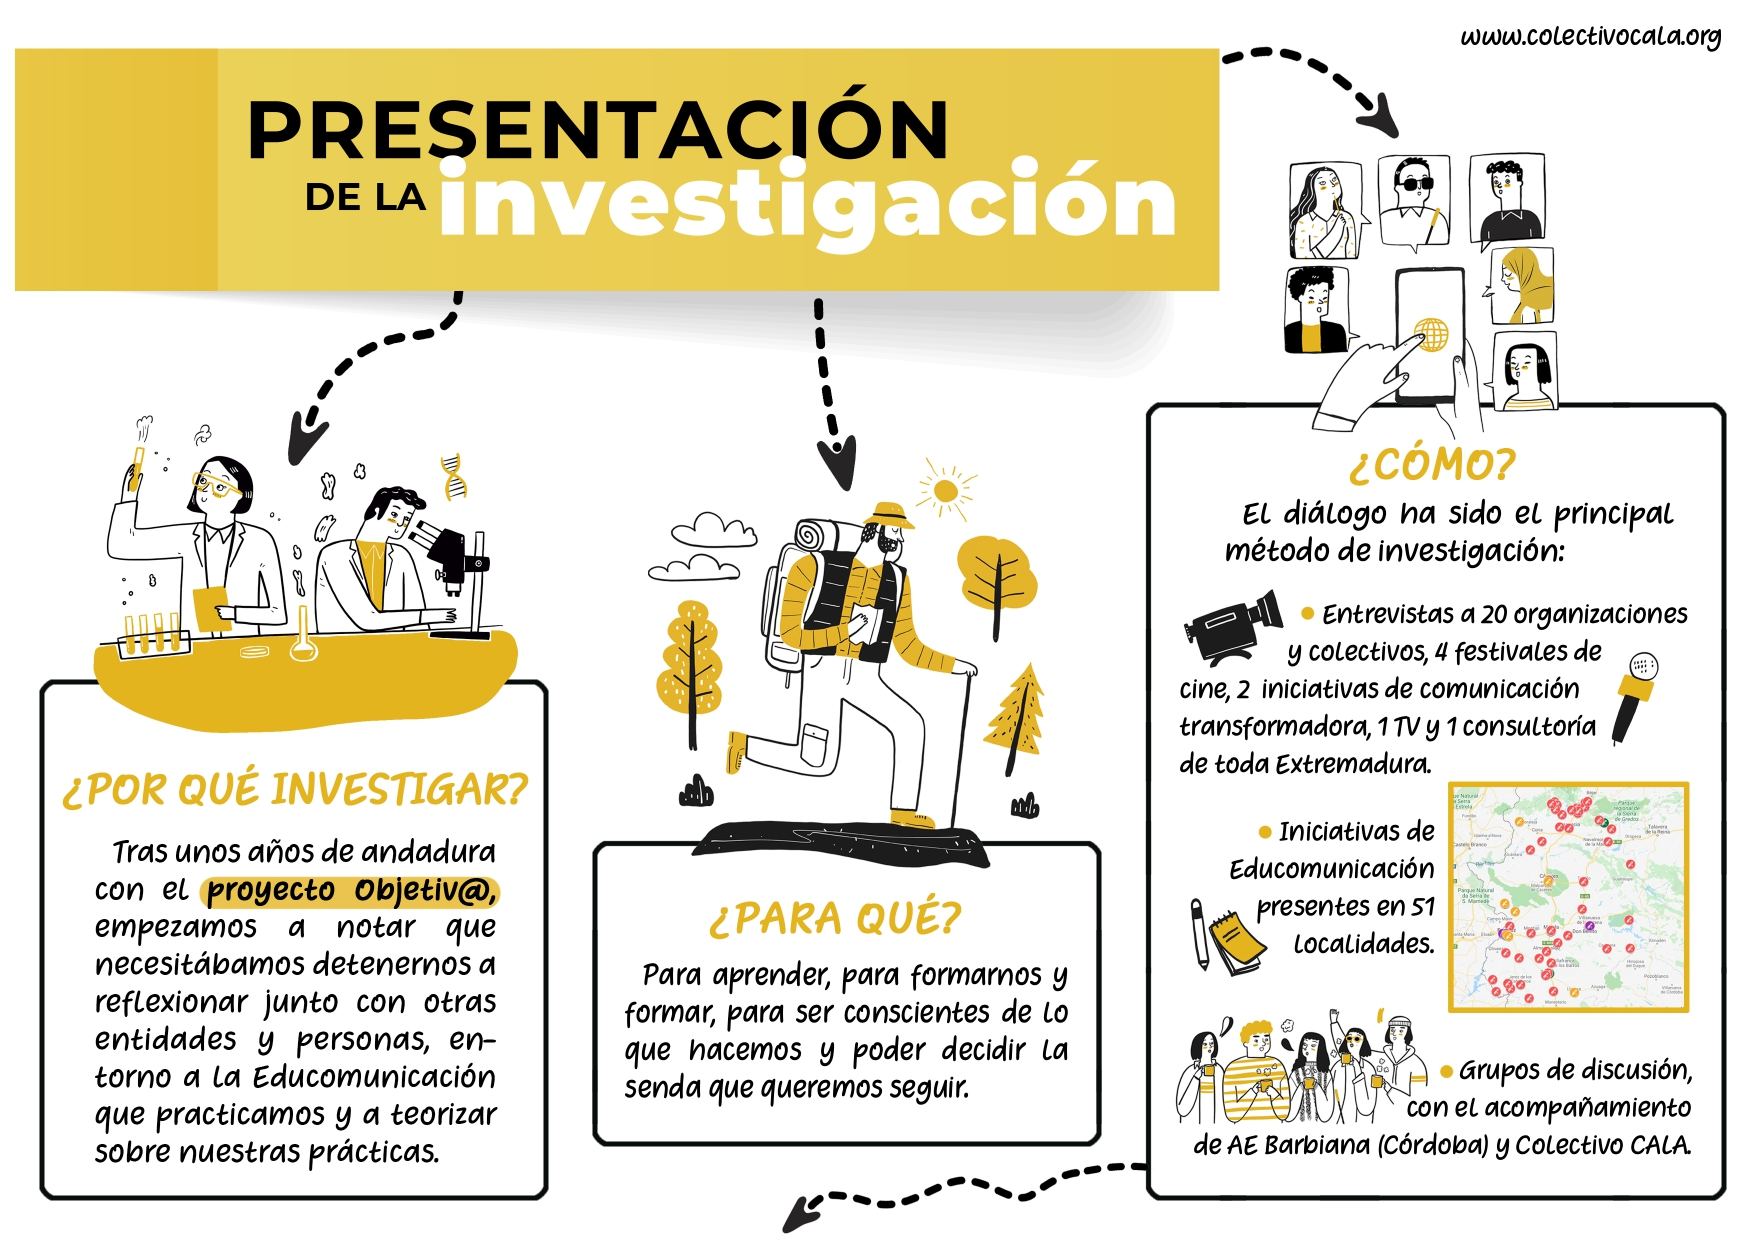 """GRAFINFORME"" DE LA INVESTIGACIÓN OBJETIV@ SOBRE PRÁCTICAS DE EDUCOMUNICACIÓN EN EXTREMADURA"